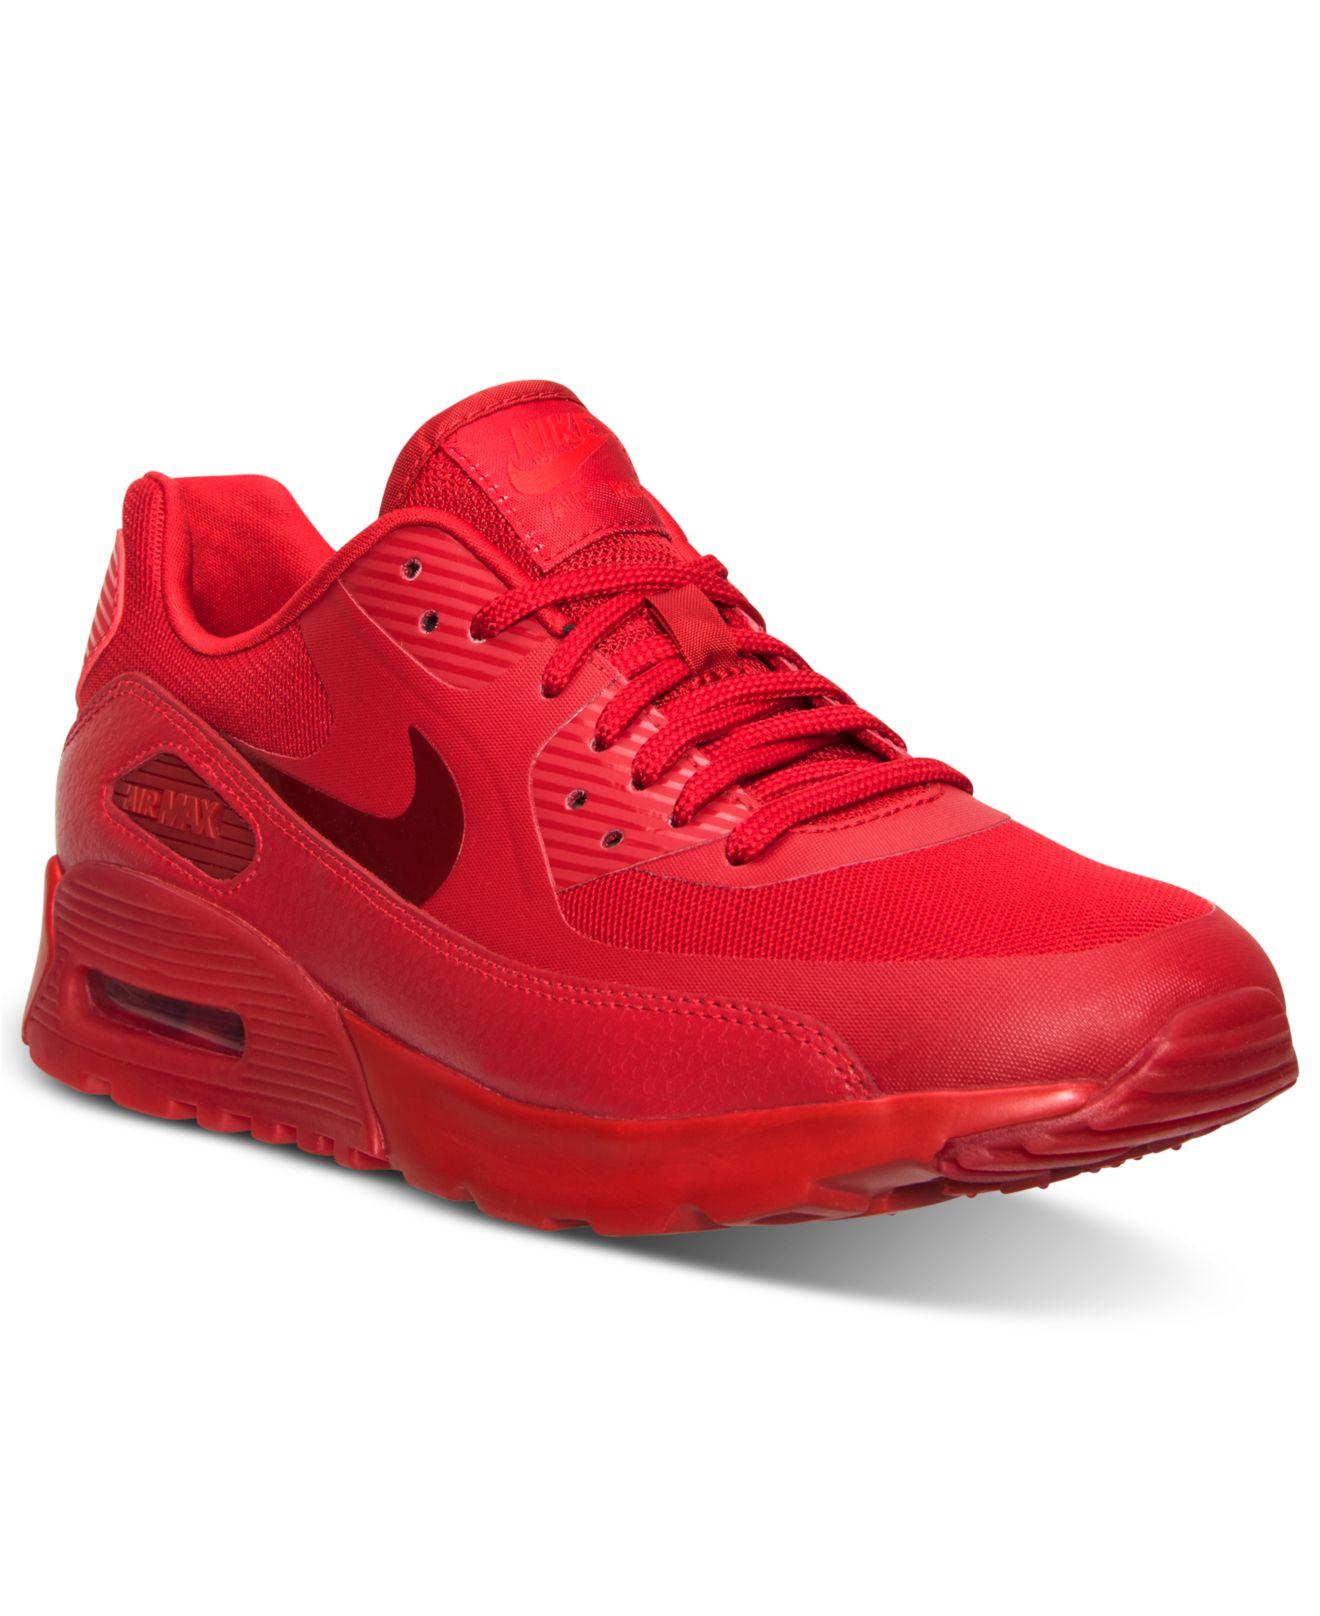 nike womens air max 90 ultra essentials running sneakers